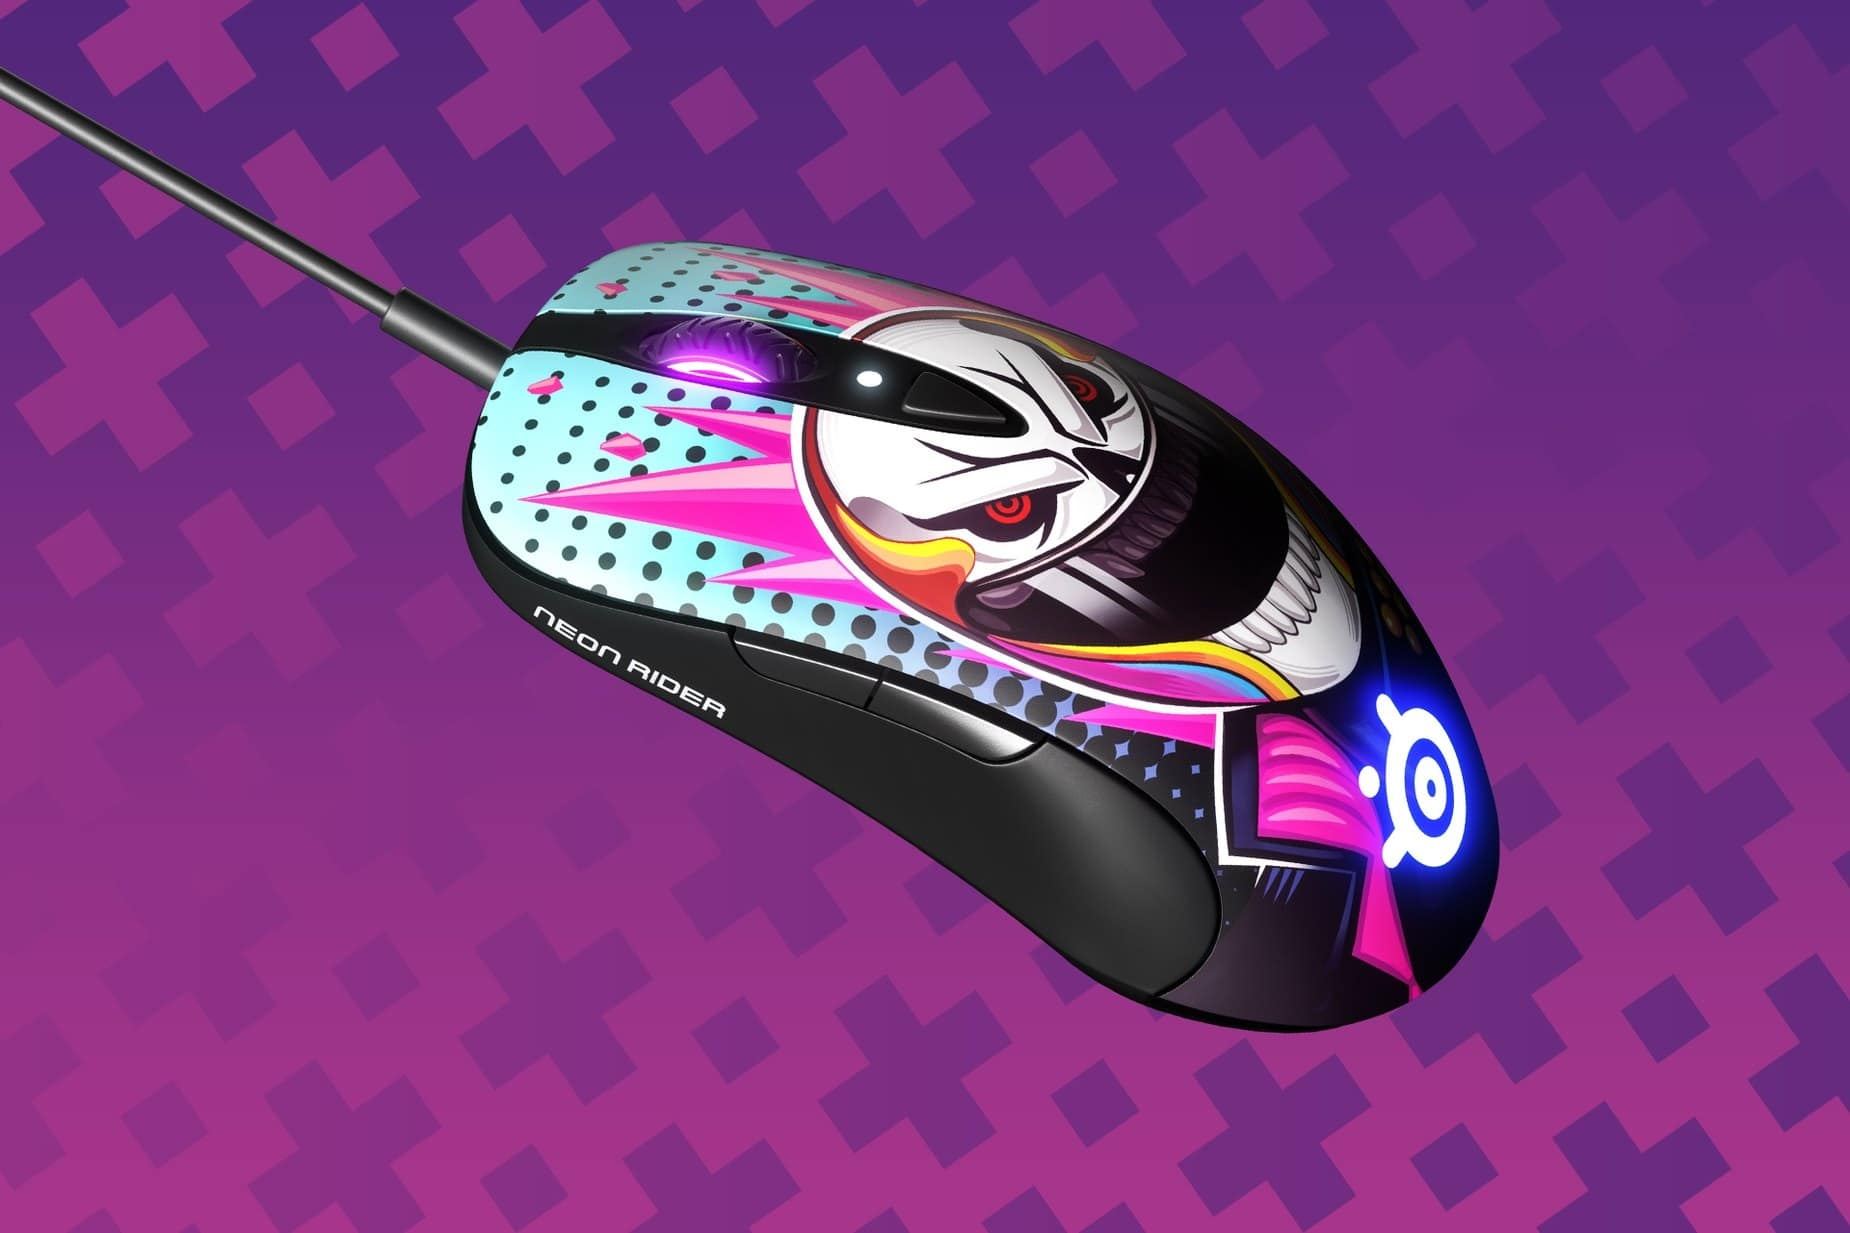 SteelSeries CS:GO Neon Rider